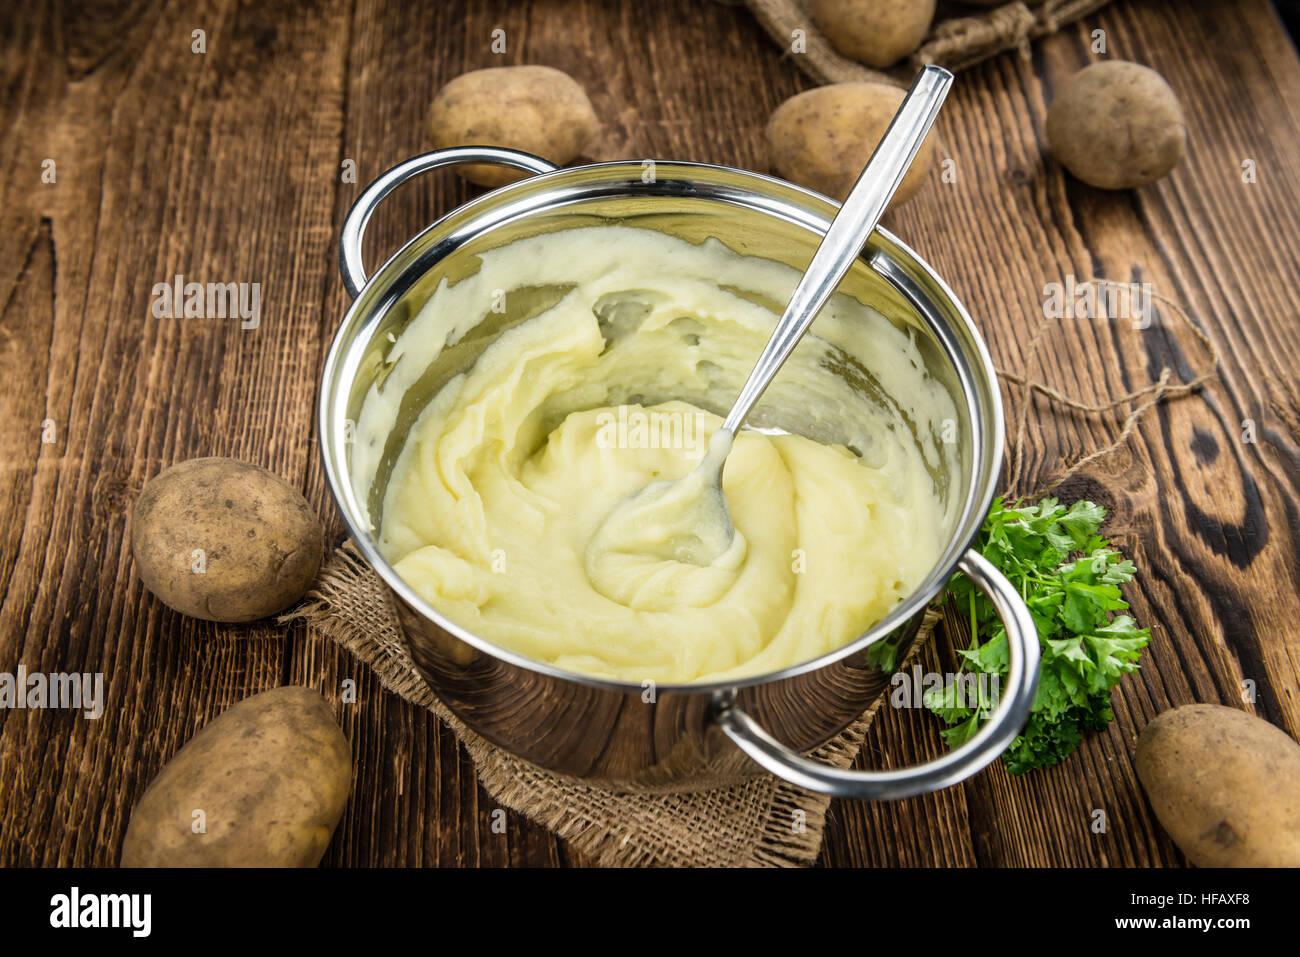 Potato Mash on rustic wooden background (close-up shot) - Stock Image